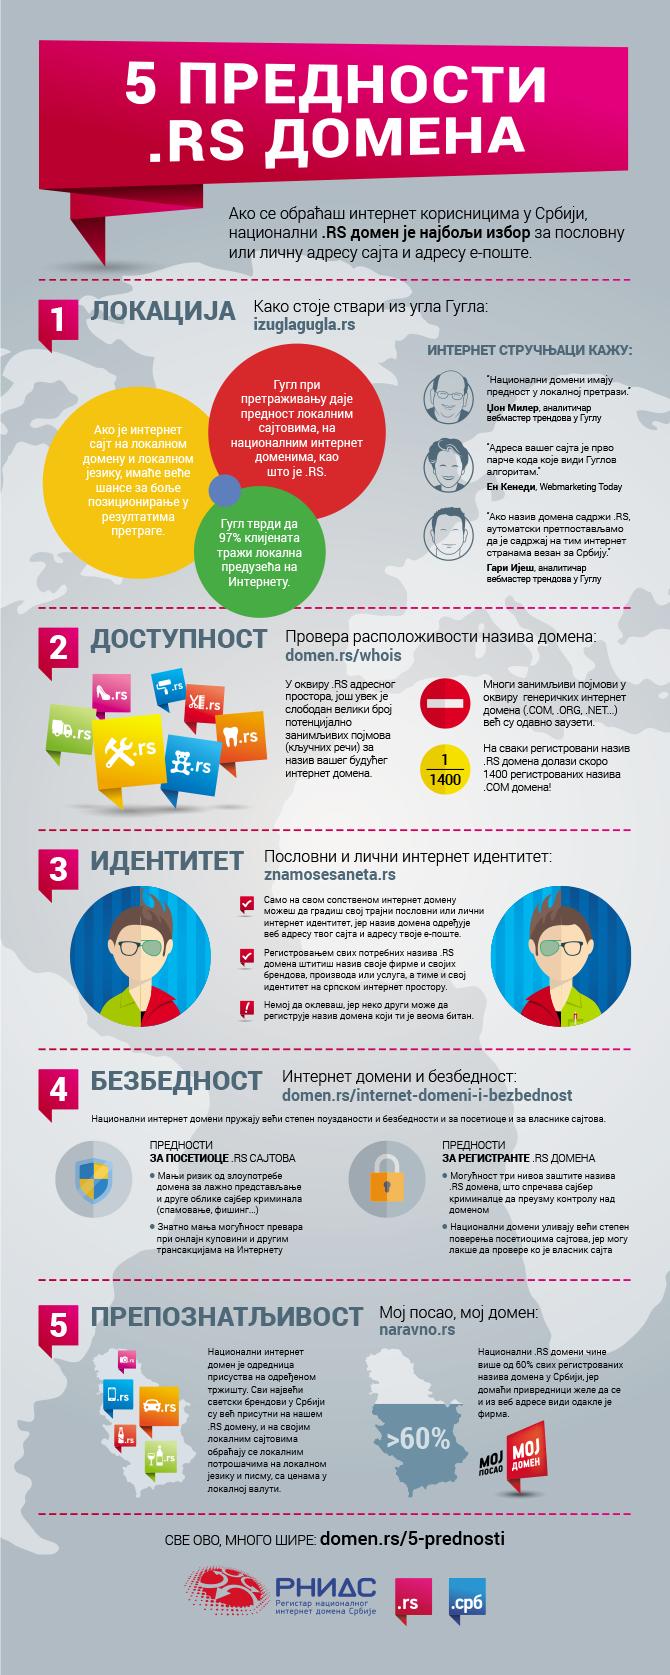 infografik prednosti .rs domena